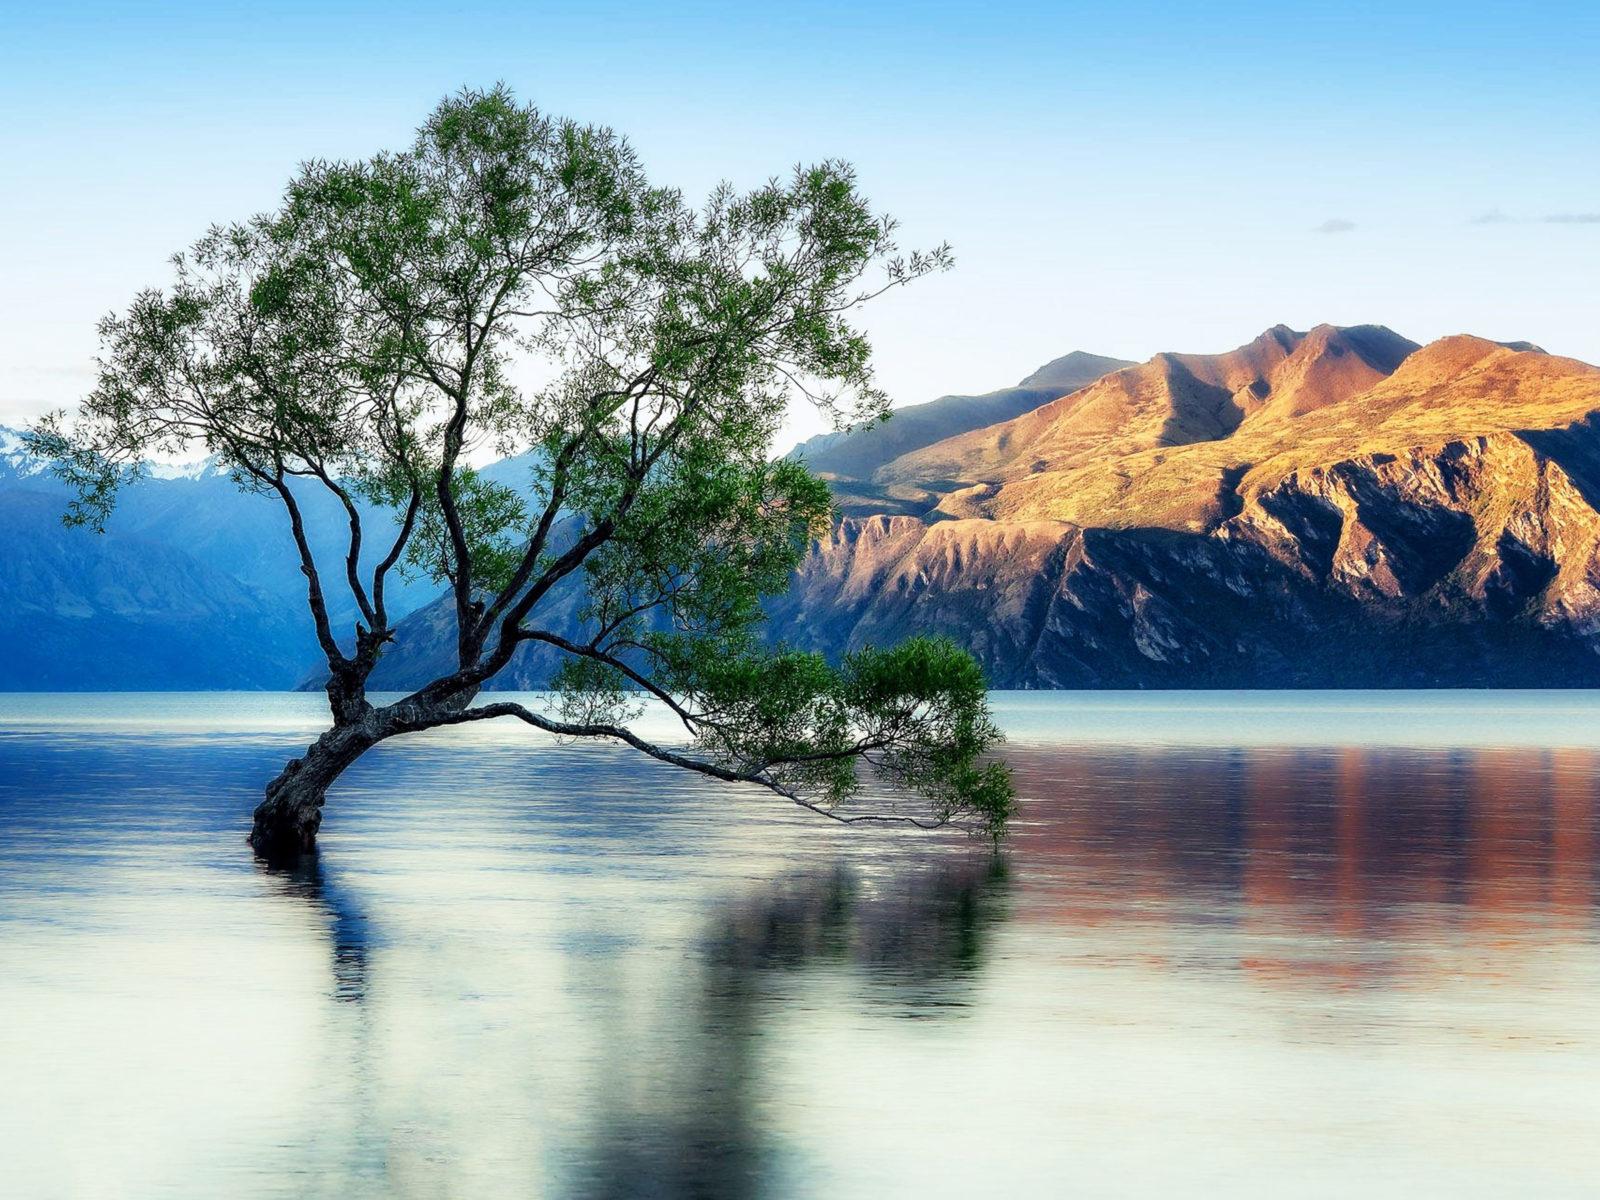 Fall Leaves Desktop Wallpaper Backgrouns Lake Wanaka Beautiful Reflection New Zealand Wallpaper For